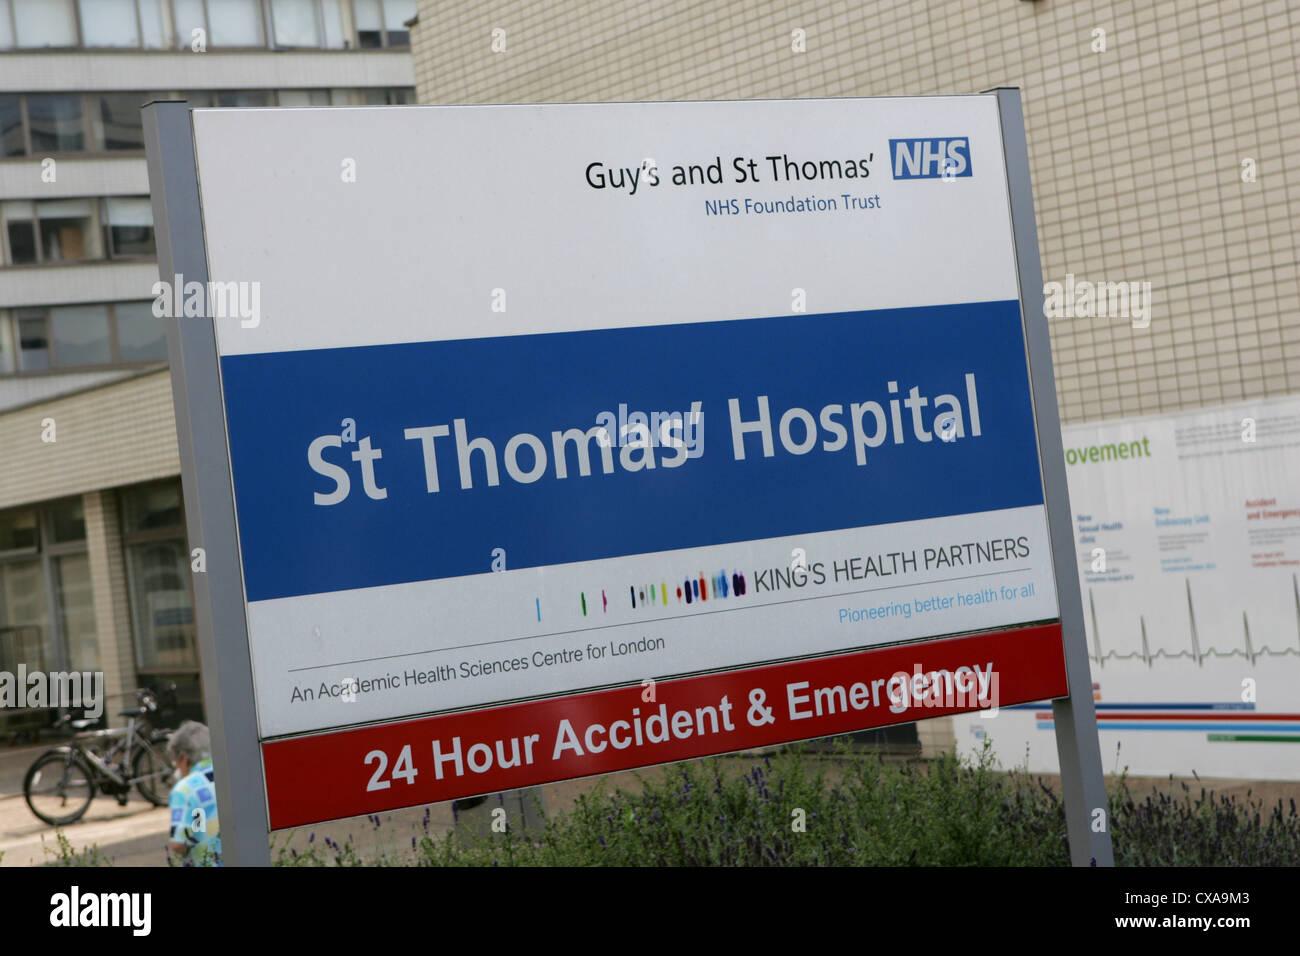 Guy es and St Thamas NHS Hospital - Juli 2012 in London Stockbild